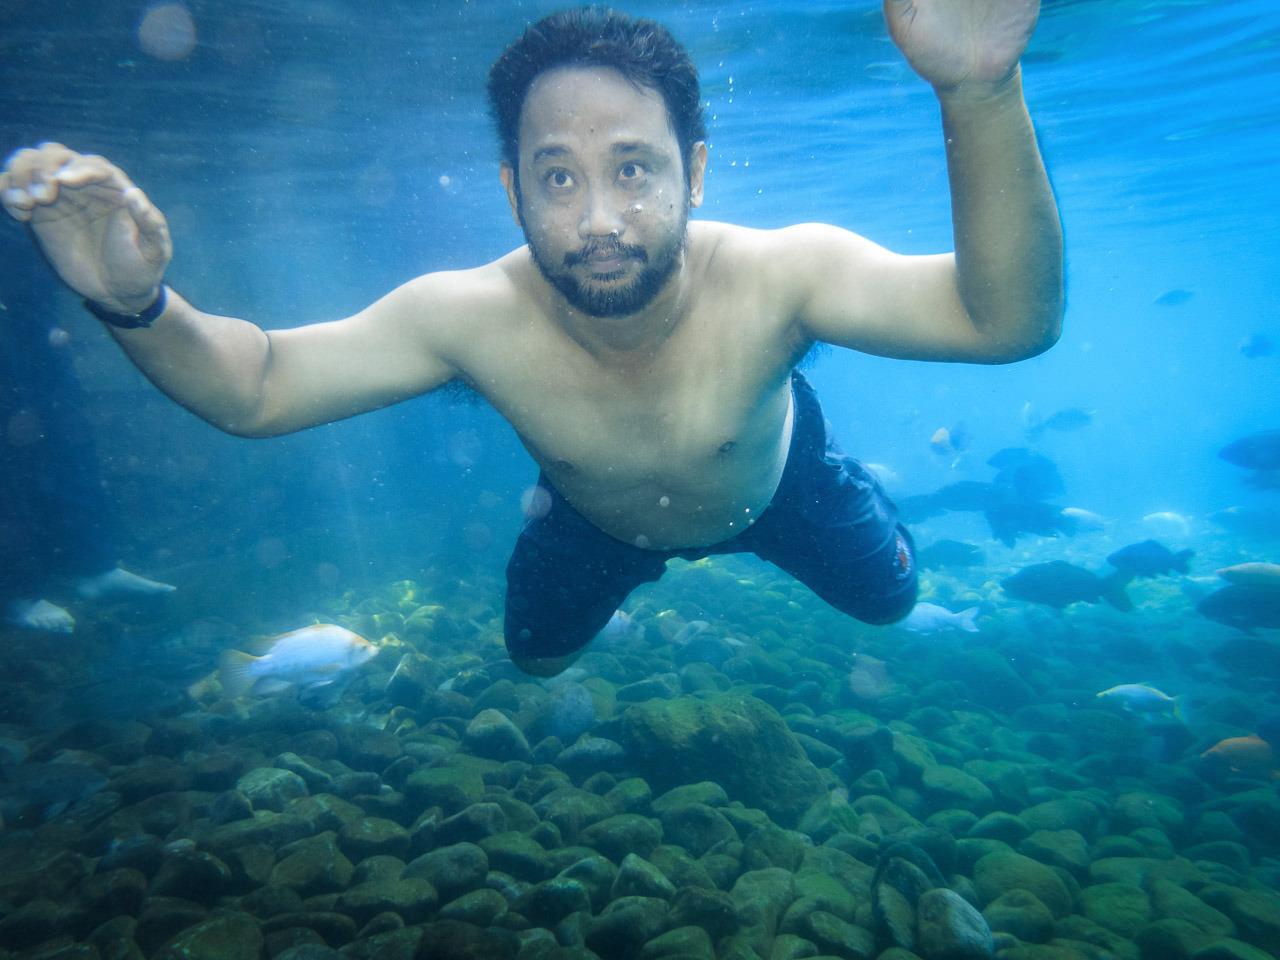 ponggok 2 - Test #2 underwater g15 - umbul Ponggok